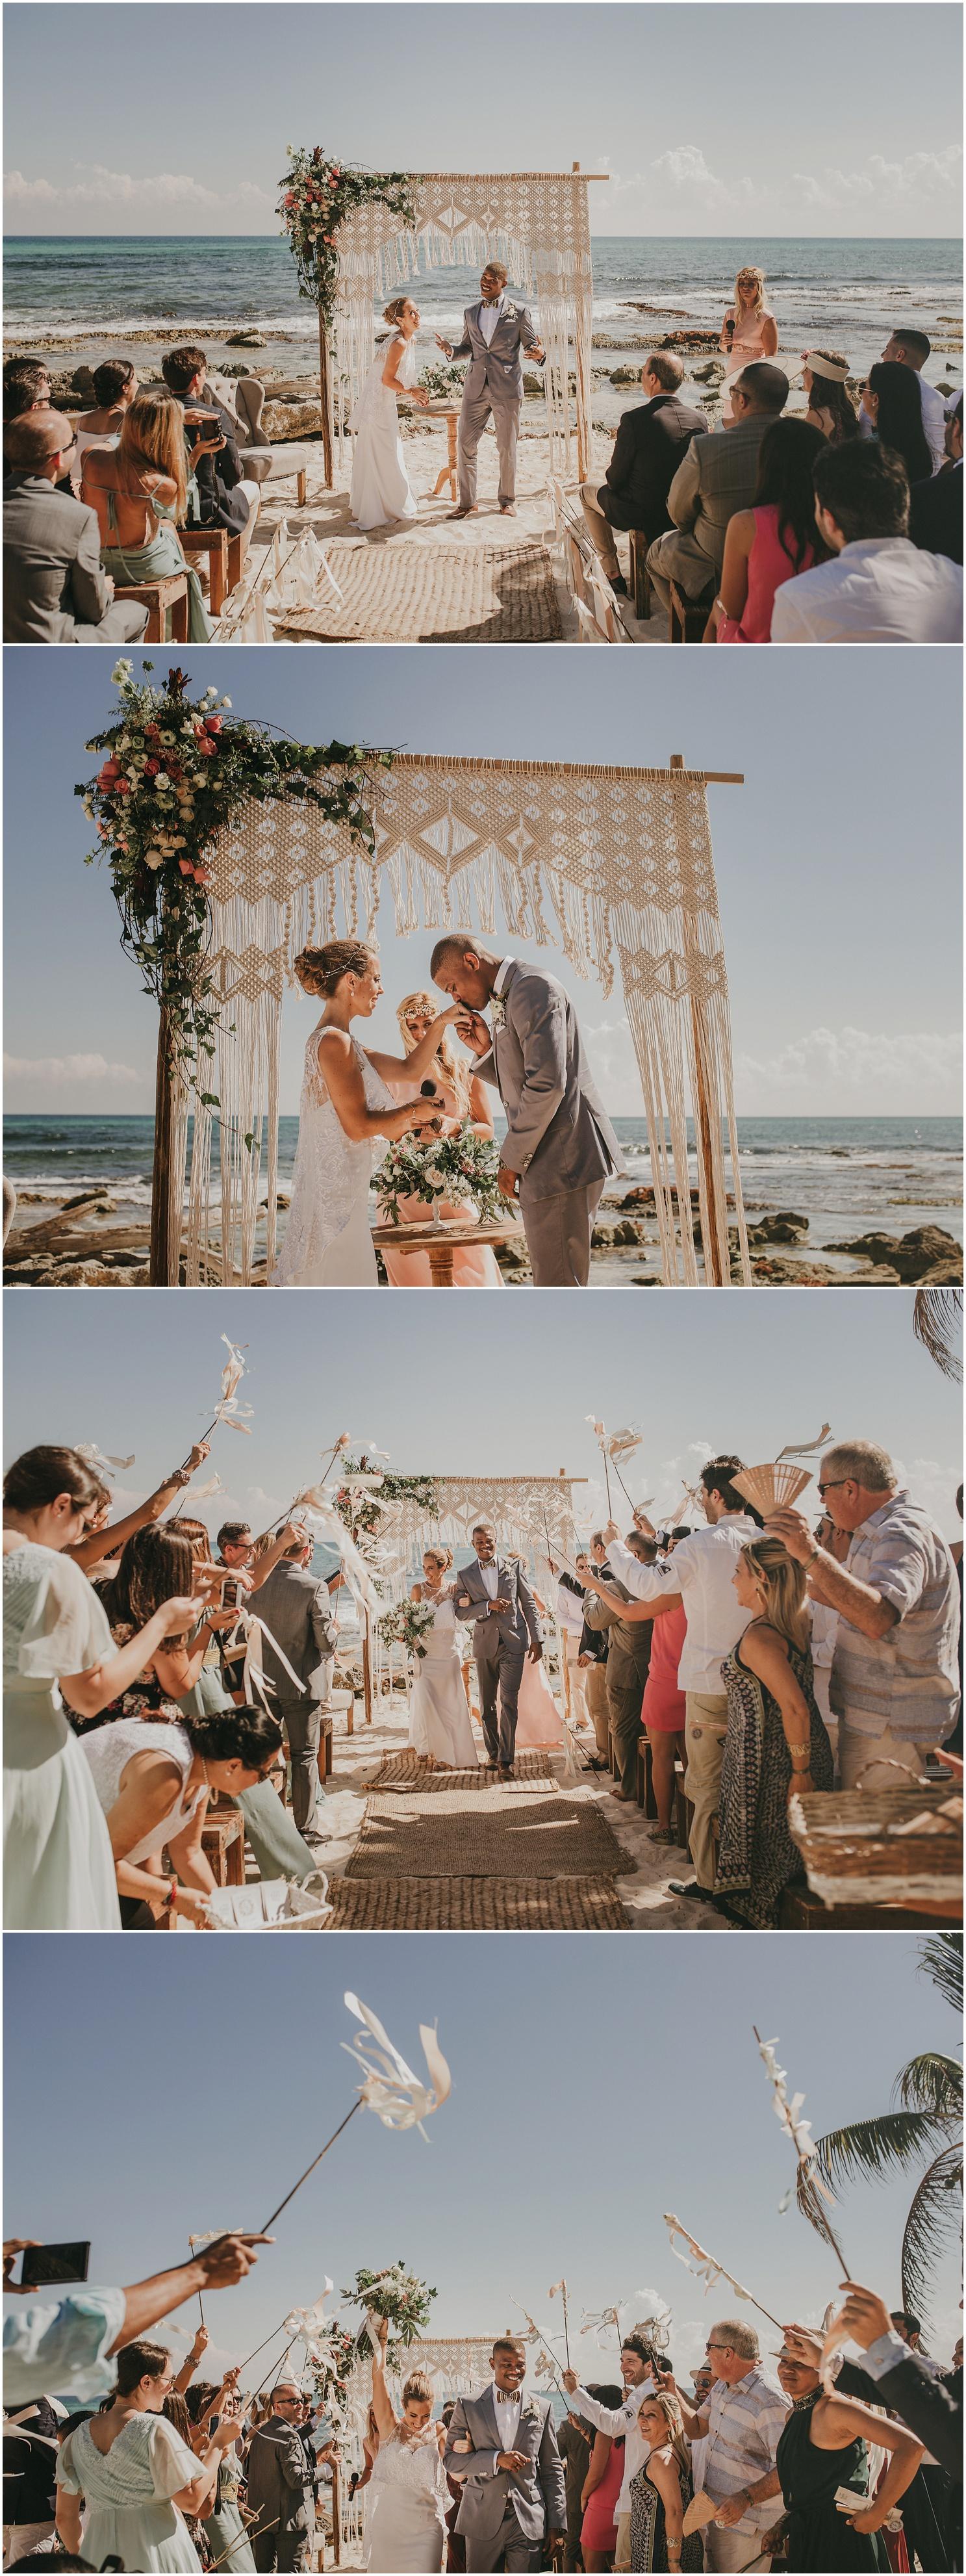 Pablo Laguia wedding photographer 076.jpg